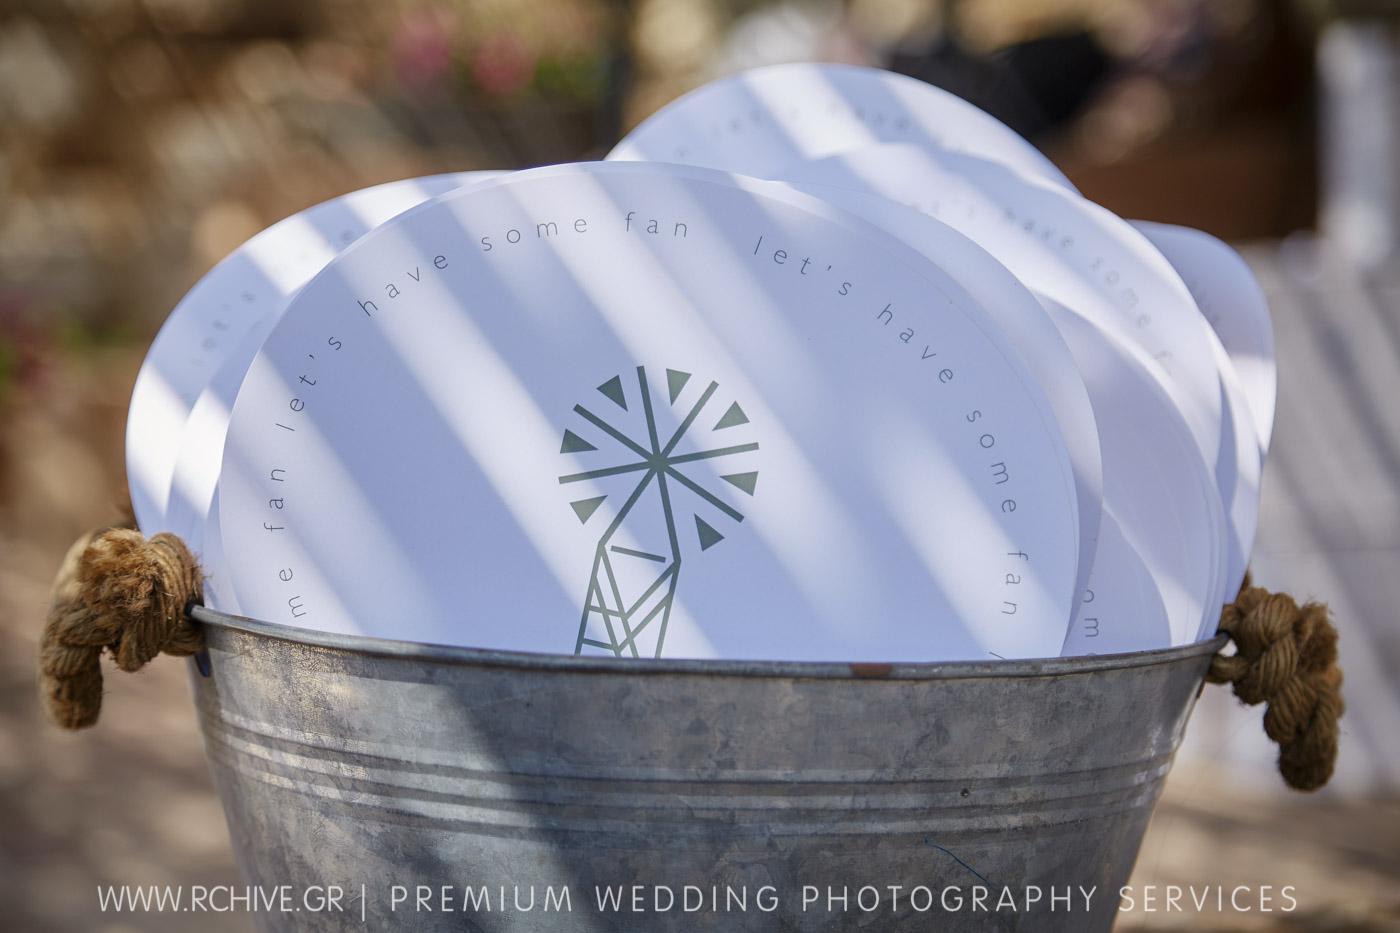 Rchive Wedding Photography